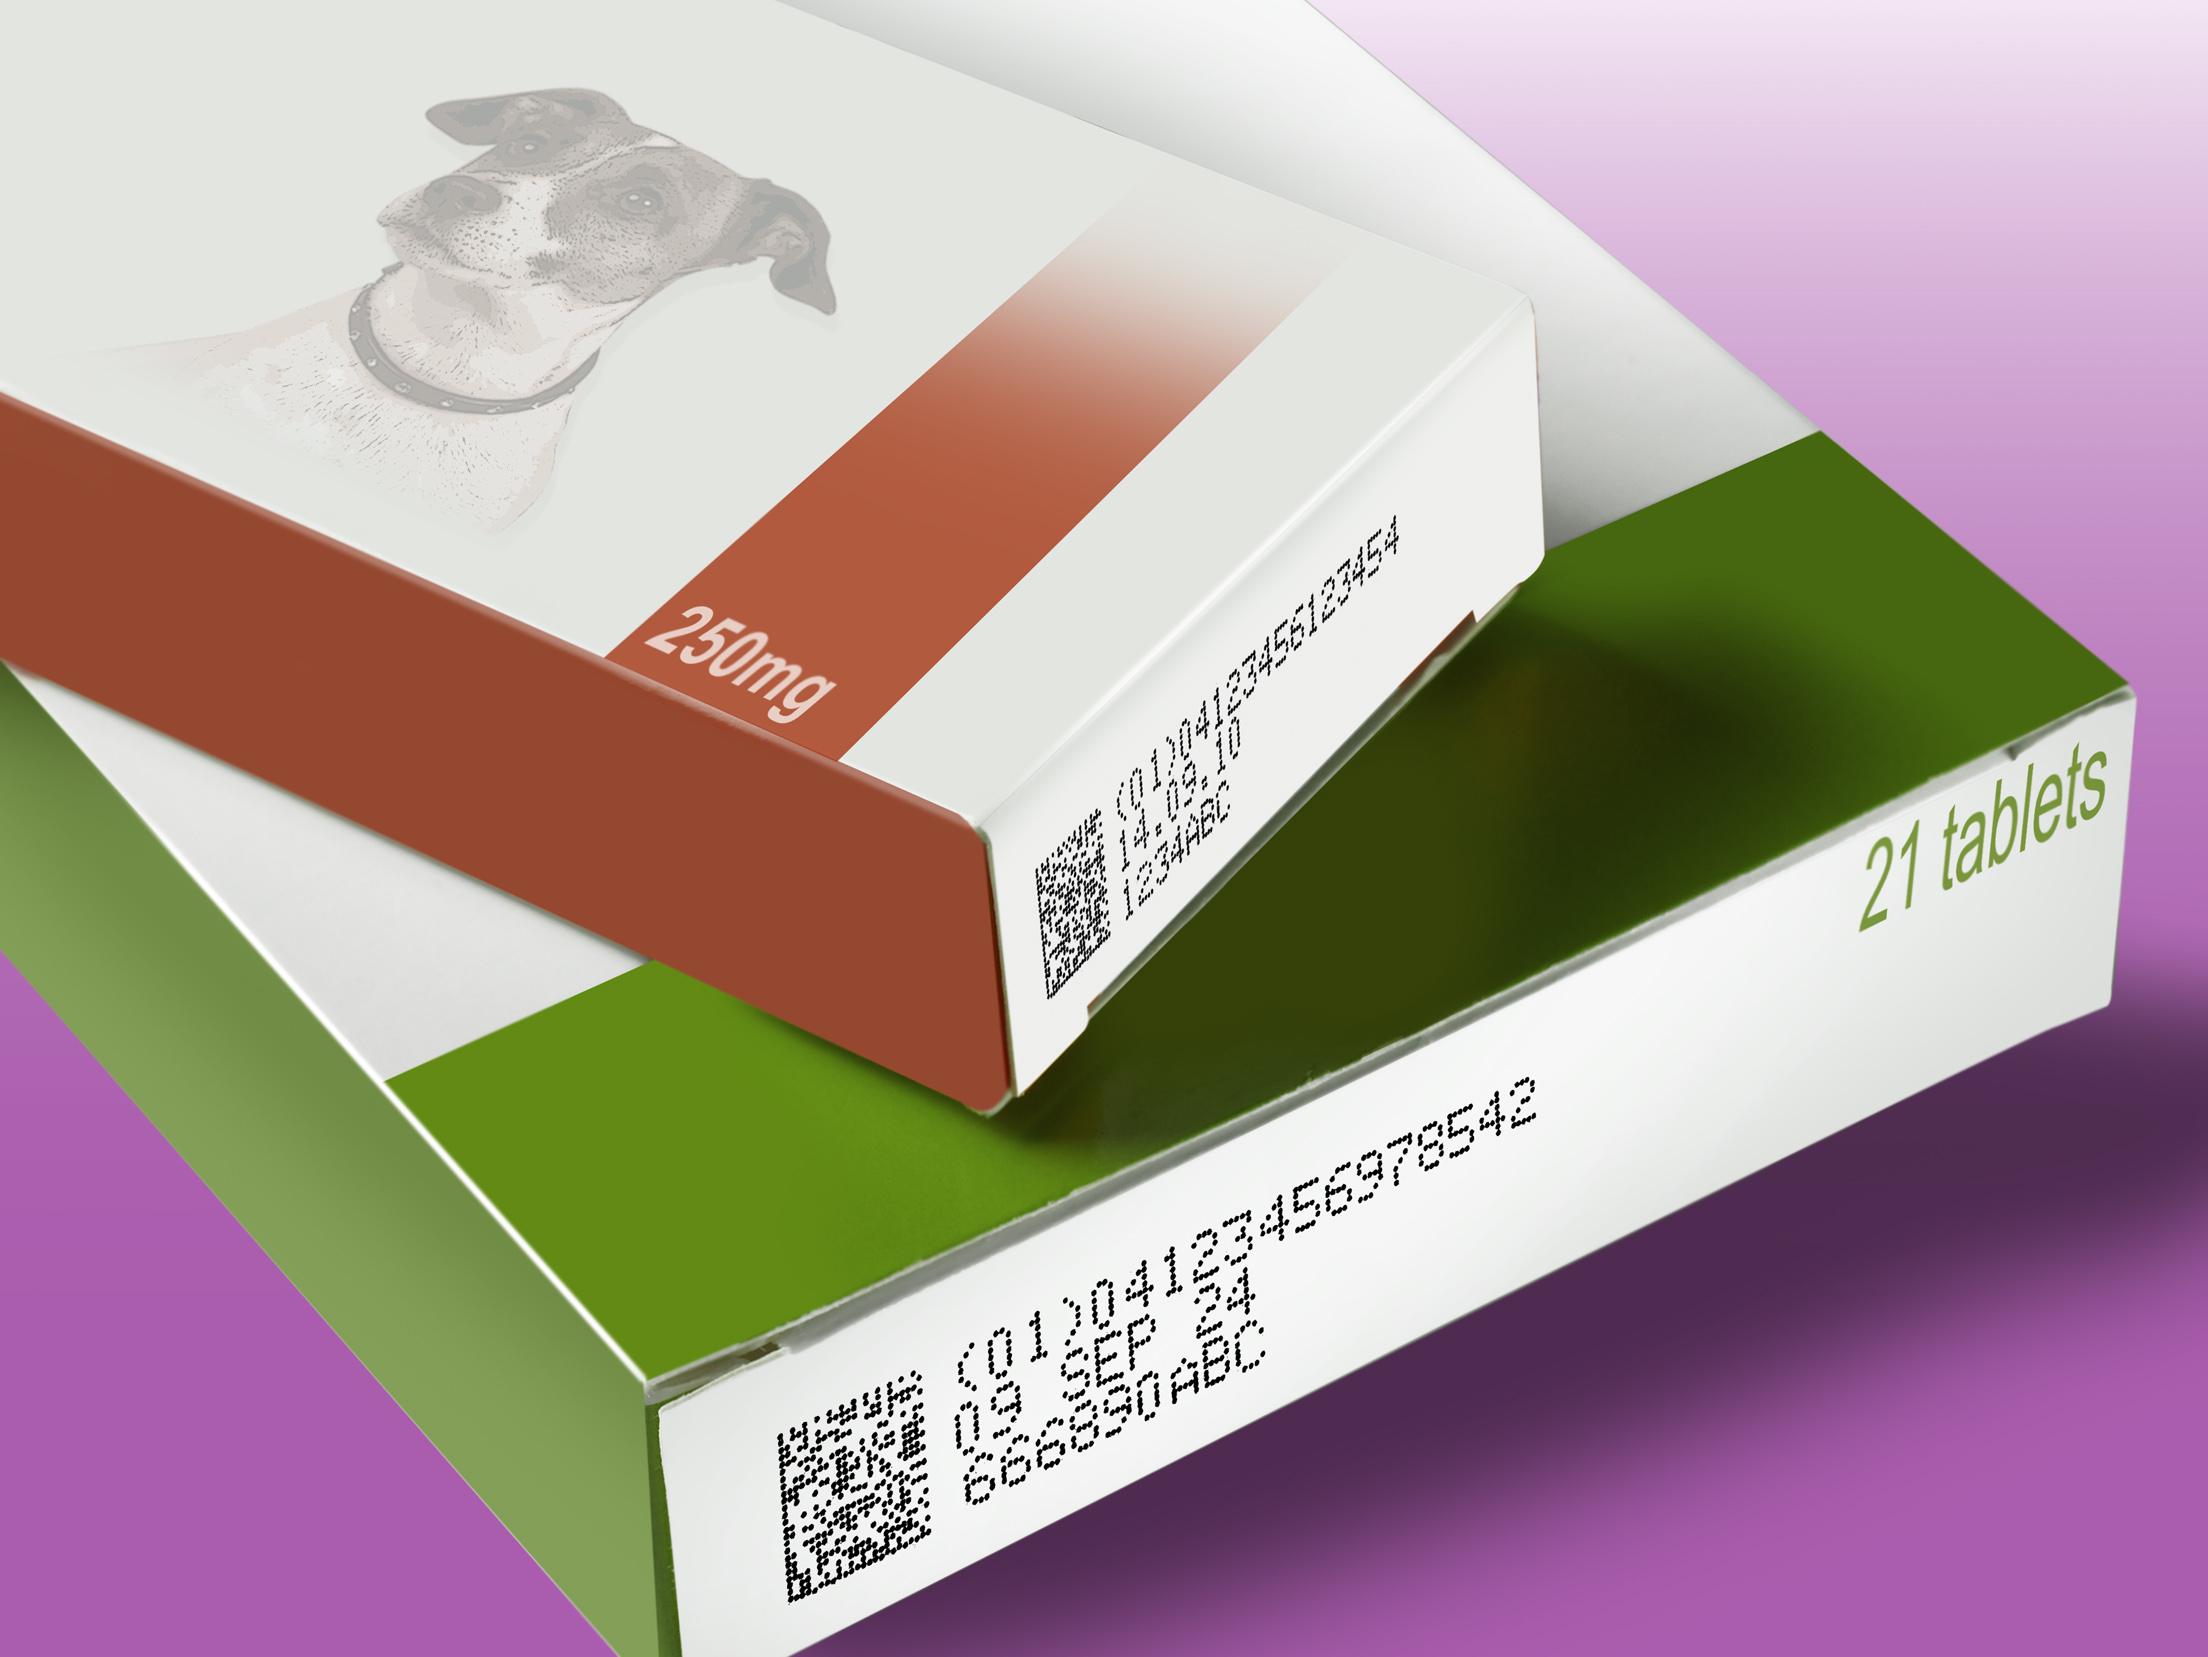 2D Data Matrix Code Animal Health Produc